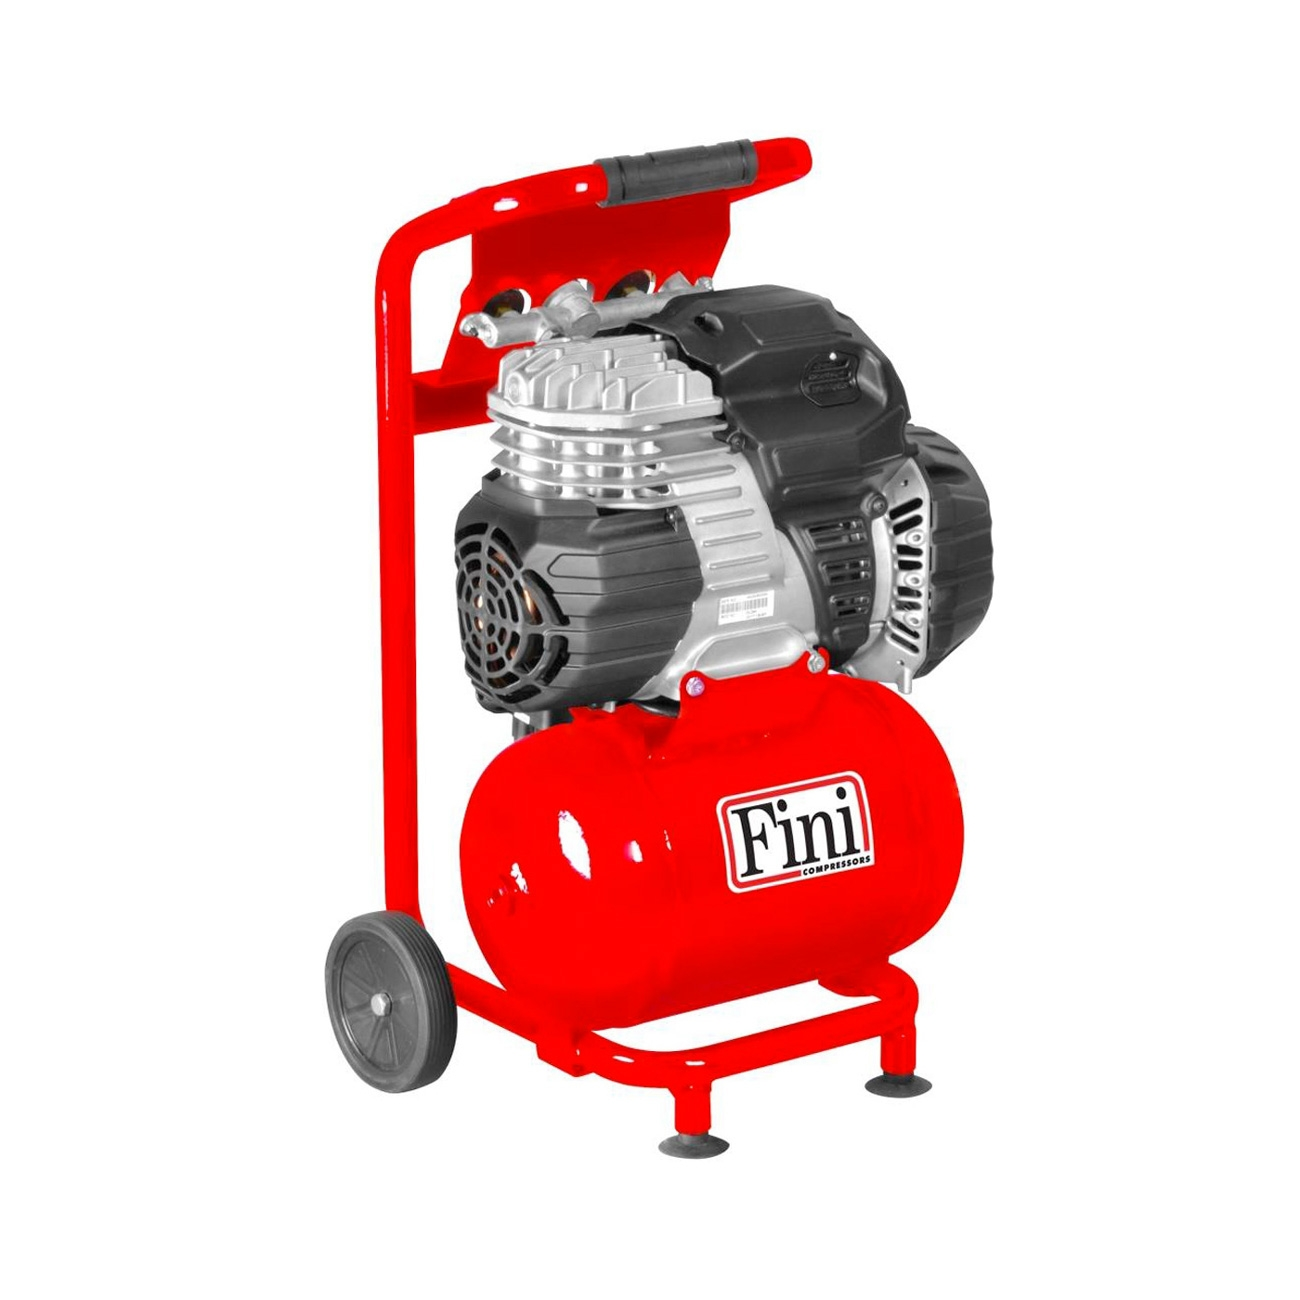 Fini OL244 / 10 PCM Air compressor 10 lt vertical